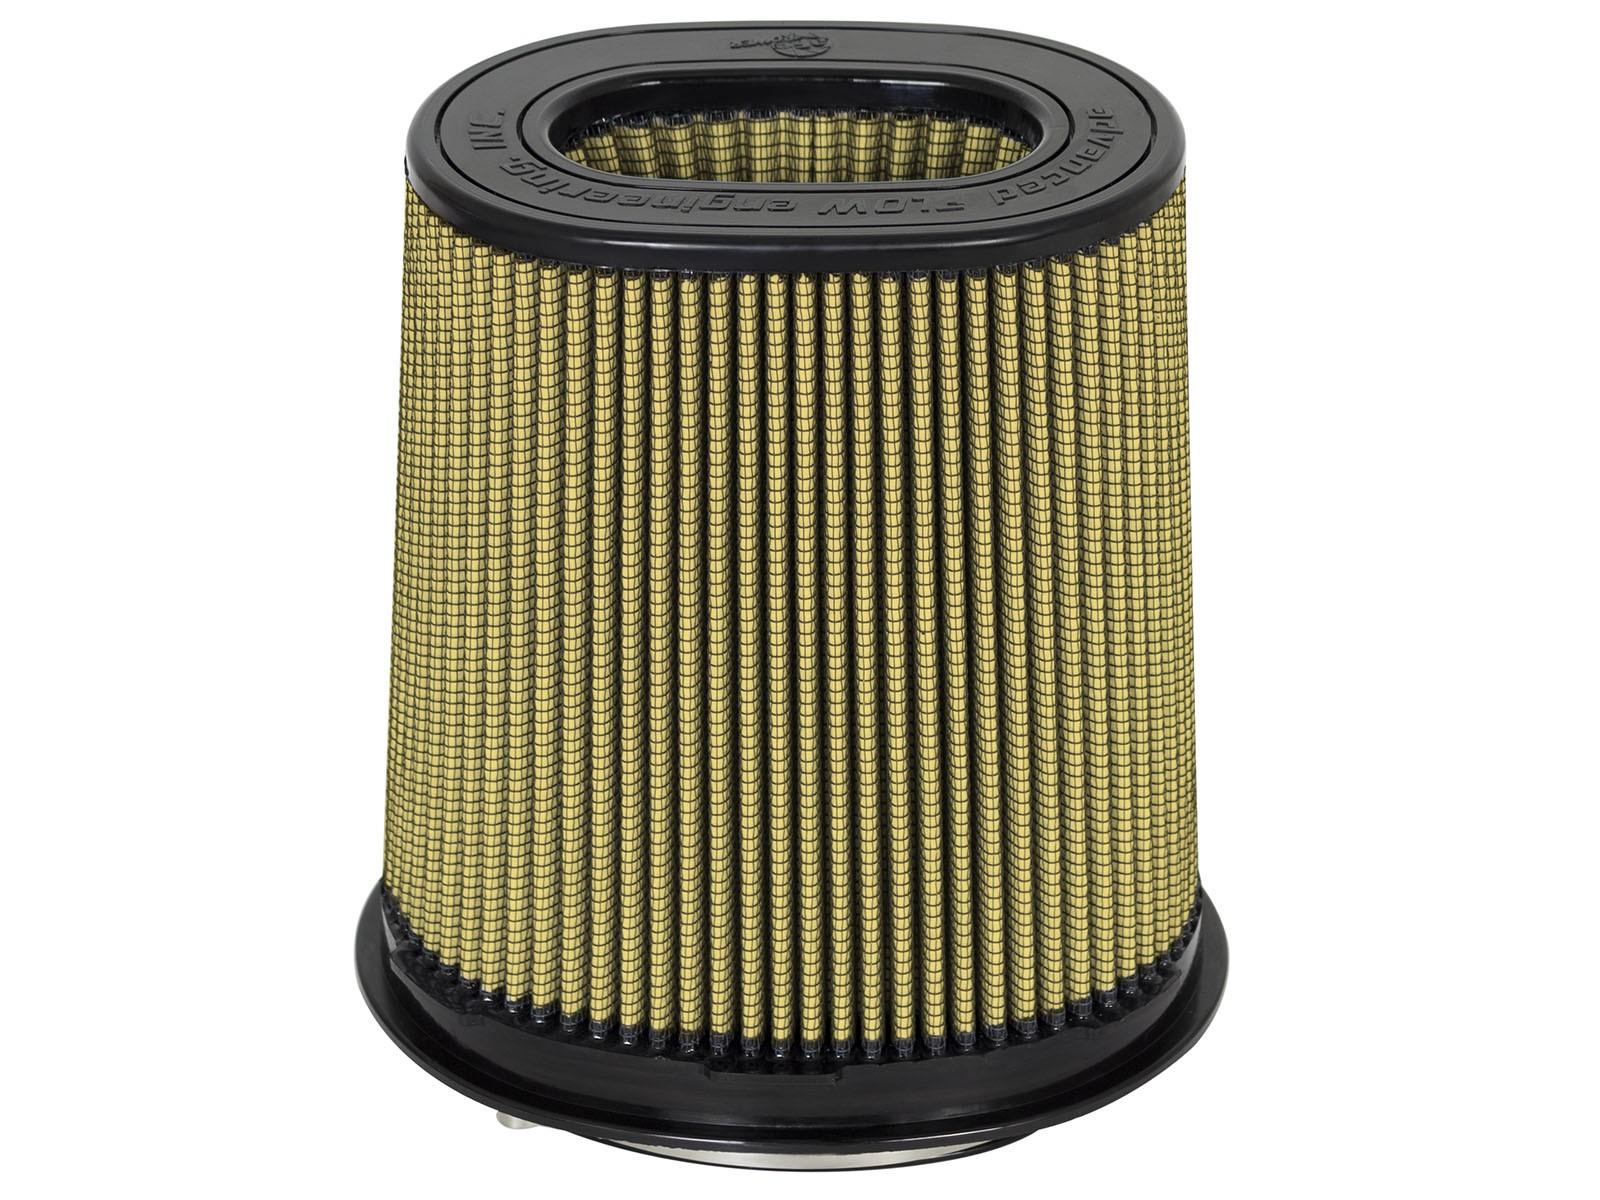 aFe POWER 72-91105 Magnum FLOW Pro GUARD7 Air Filter